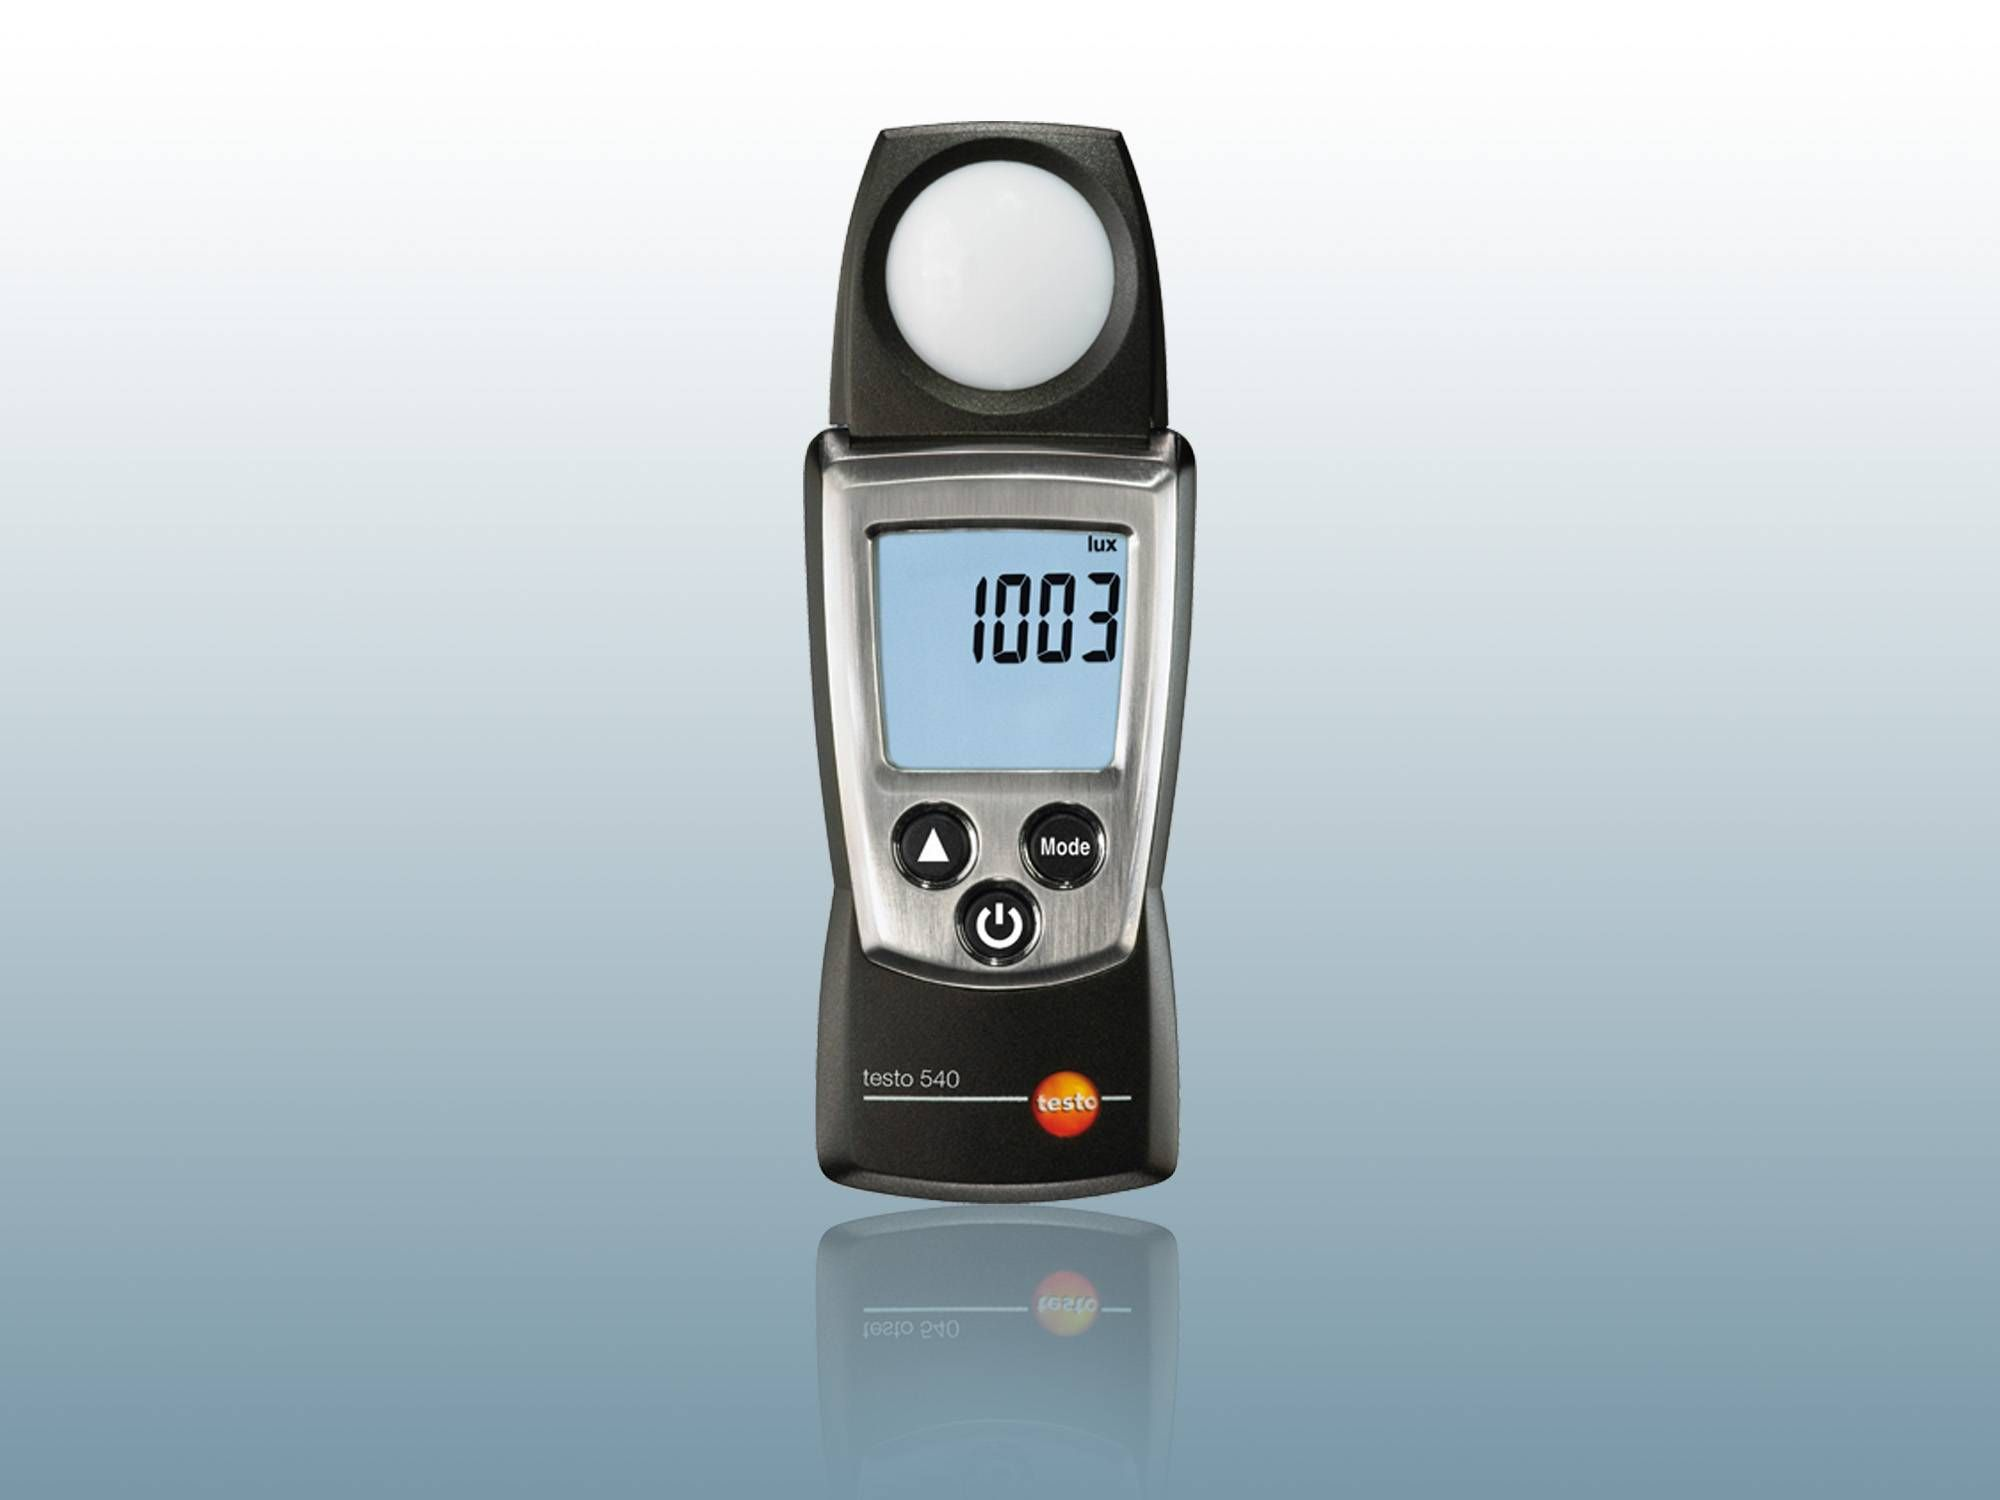 Luxmeter / Messung der Beleuchtungsstärke